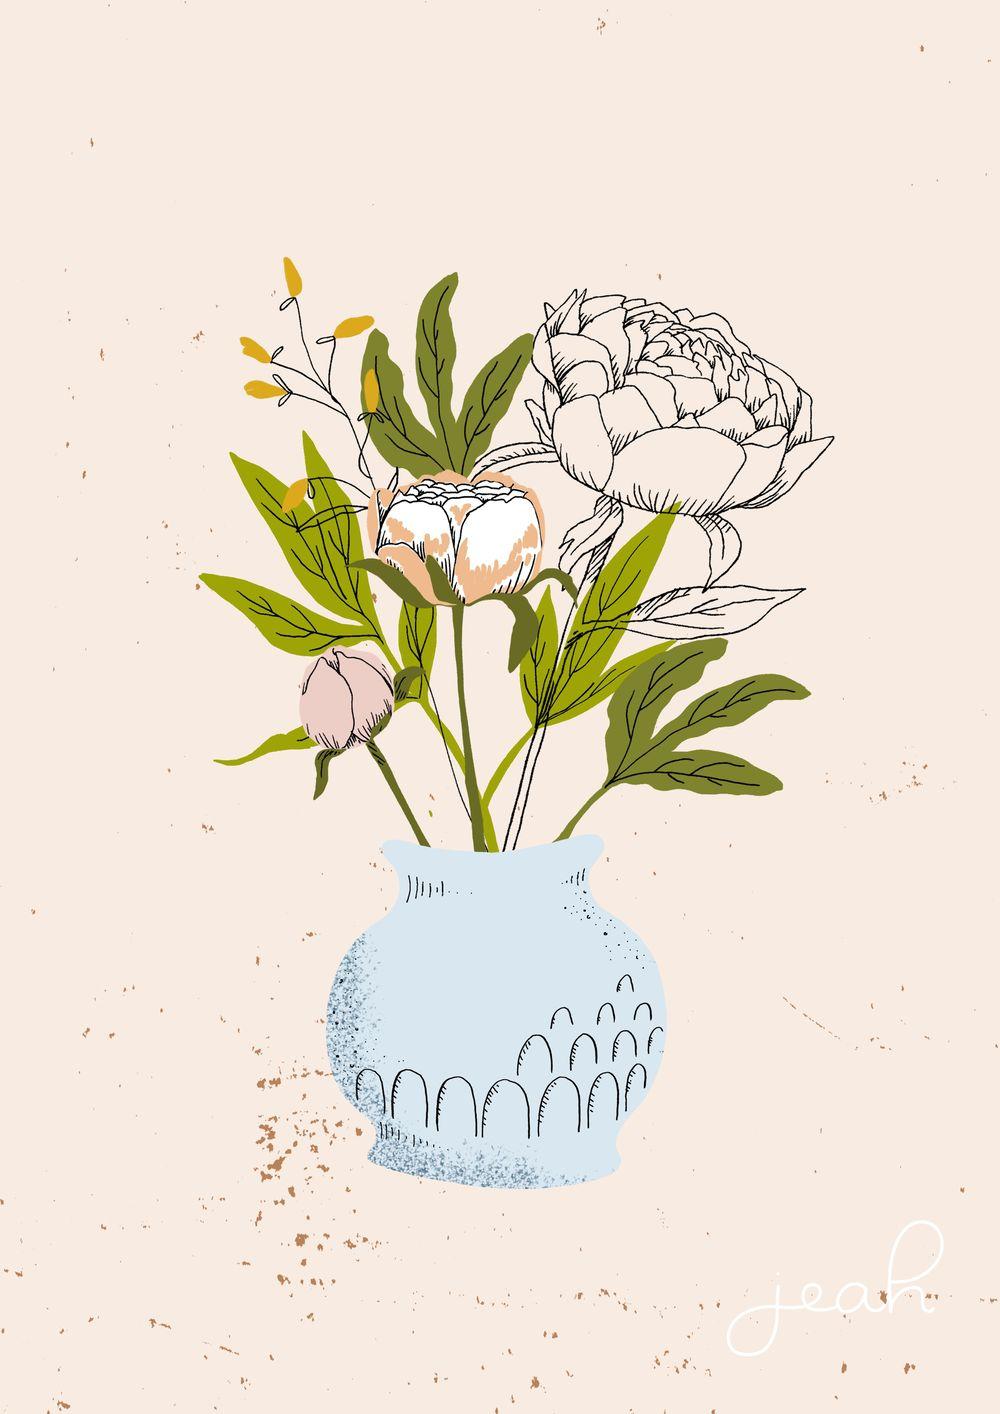 Orion bouquet - image 2 - student project